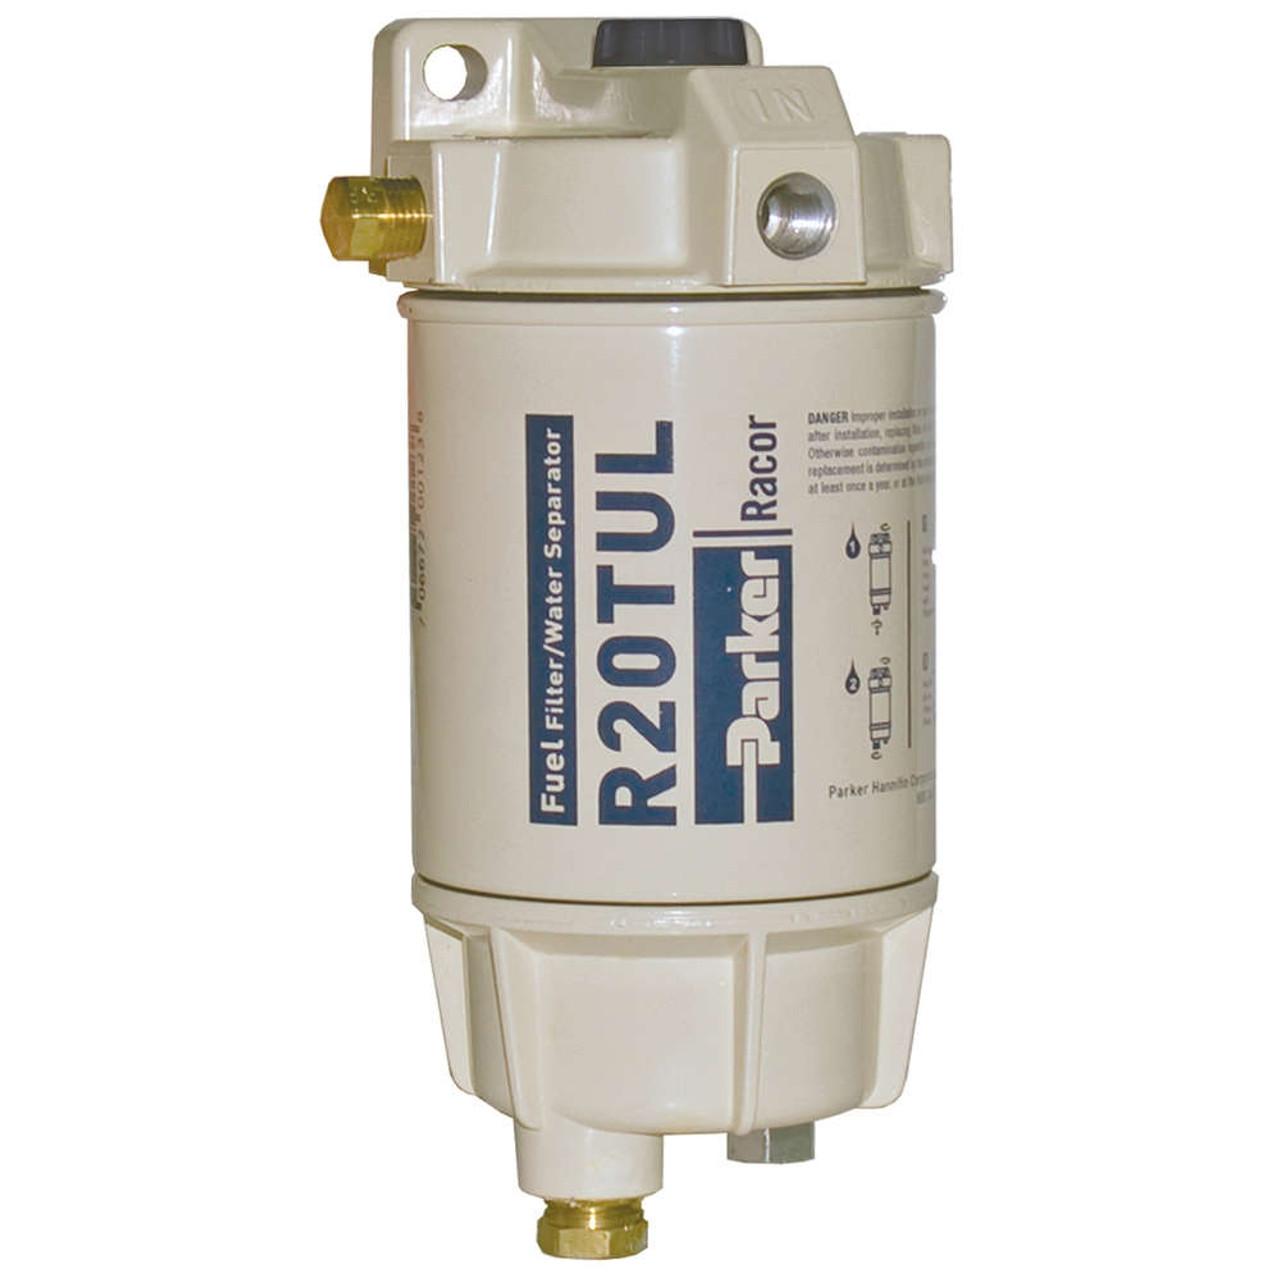 racor 1 4 in 30 gph aquabloc marine spin on type diesel fuel filterracor 1 4 in 30 gph aquabloc marine spin on type diesel fuel filter water separator  [ 1000 x 1000 Pixel ]